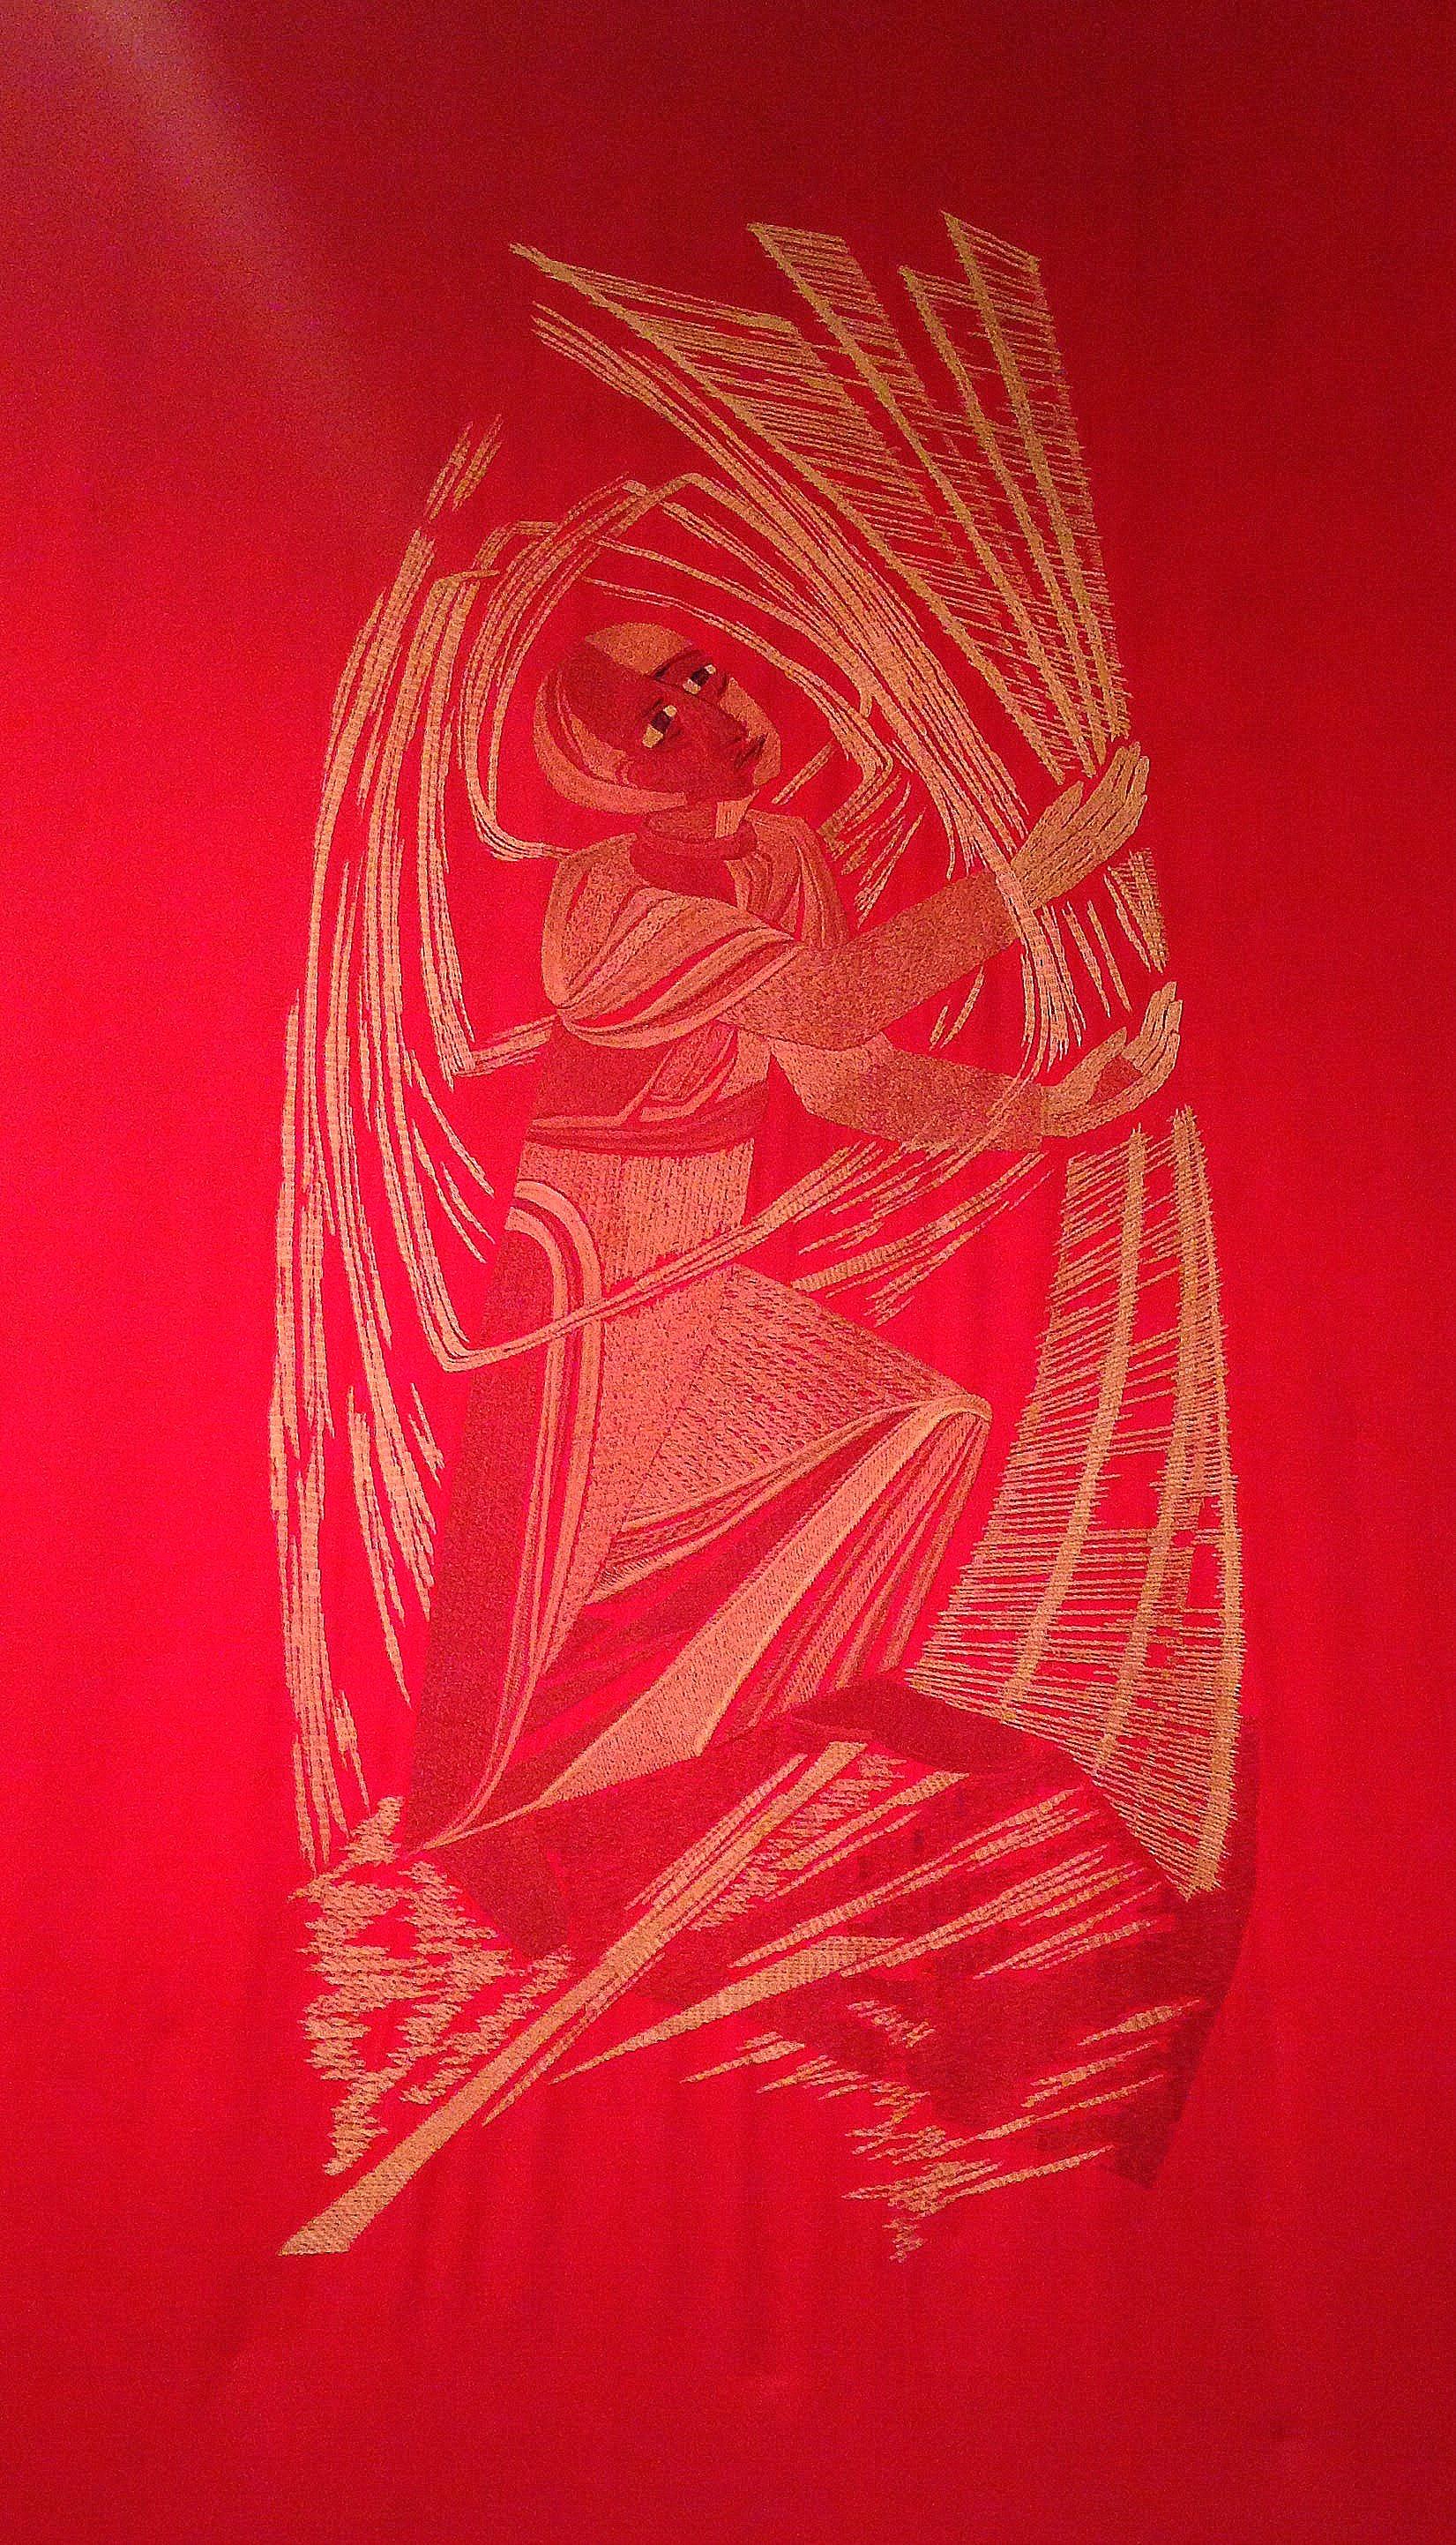 pallotti-tapestry-fremendigen